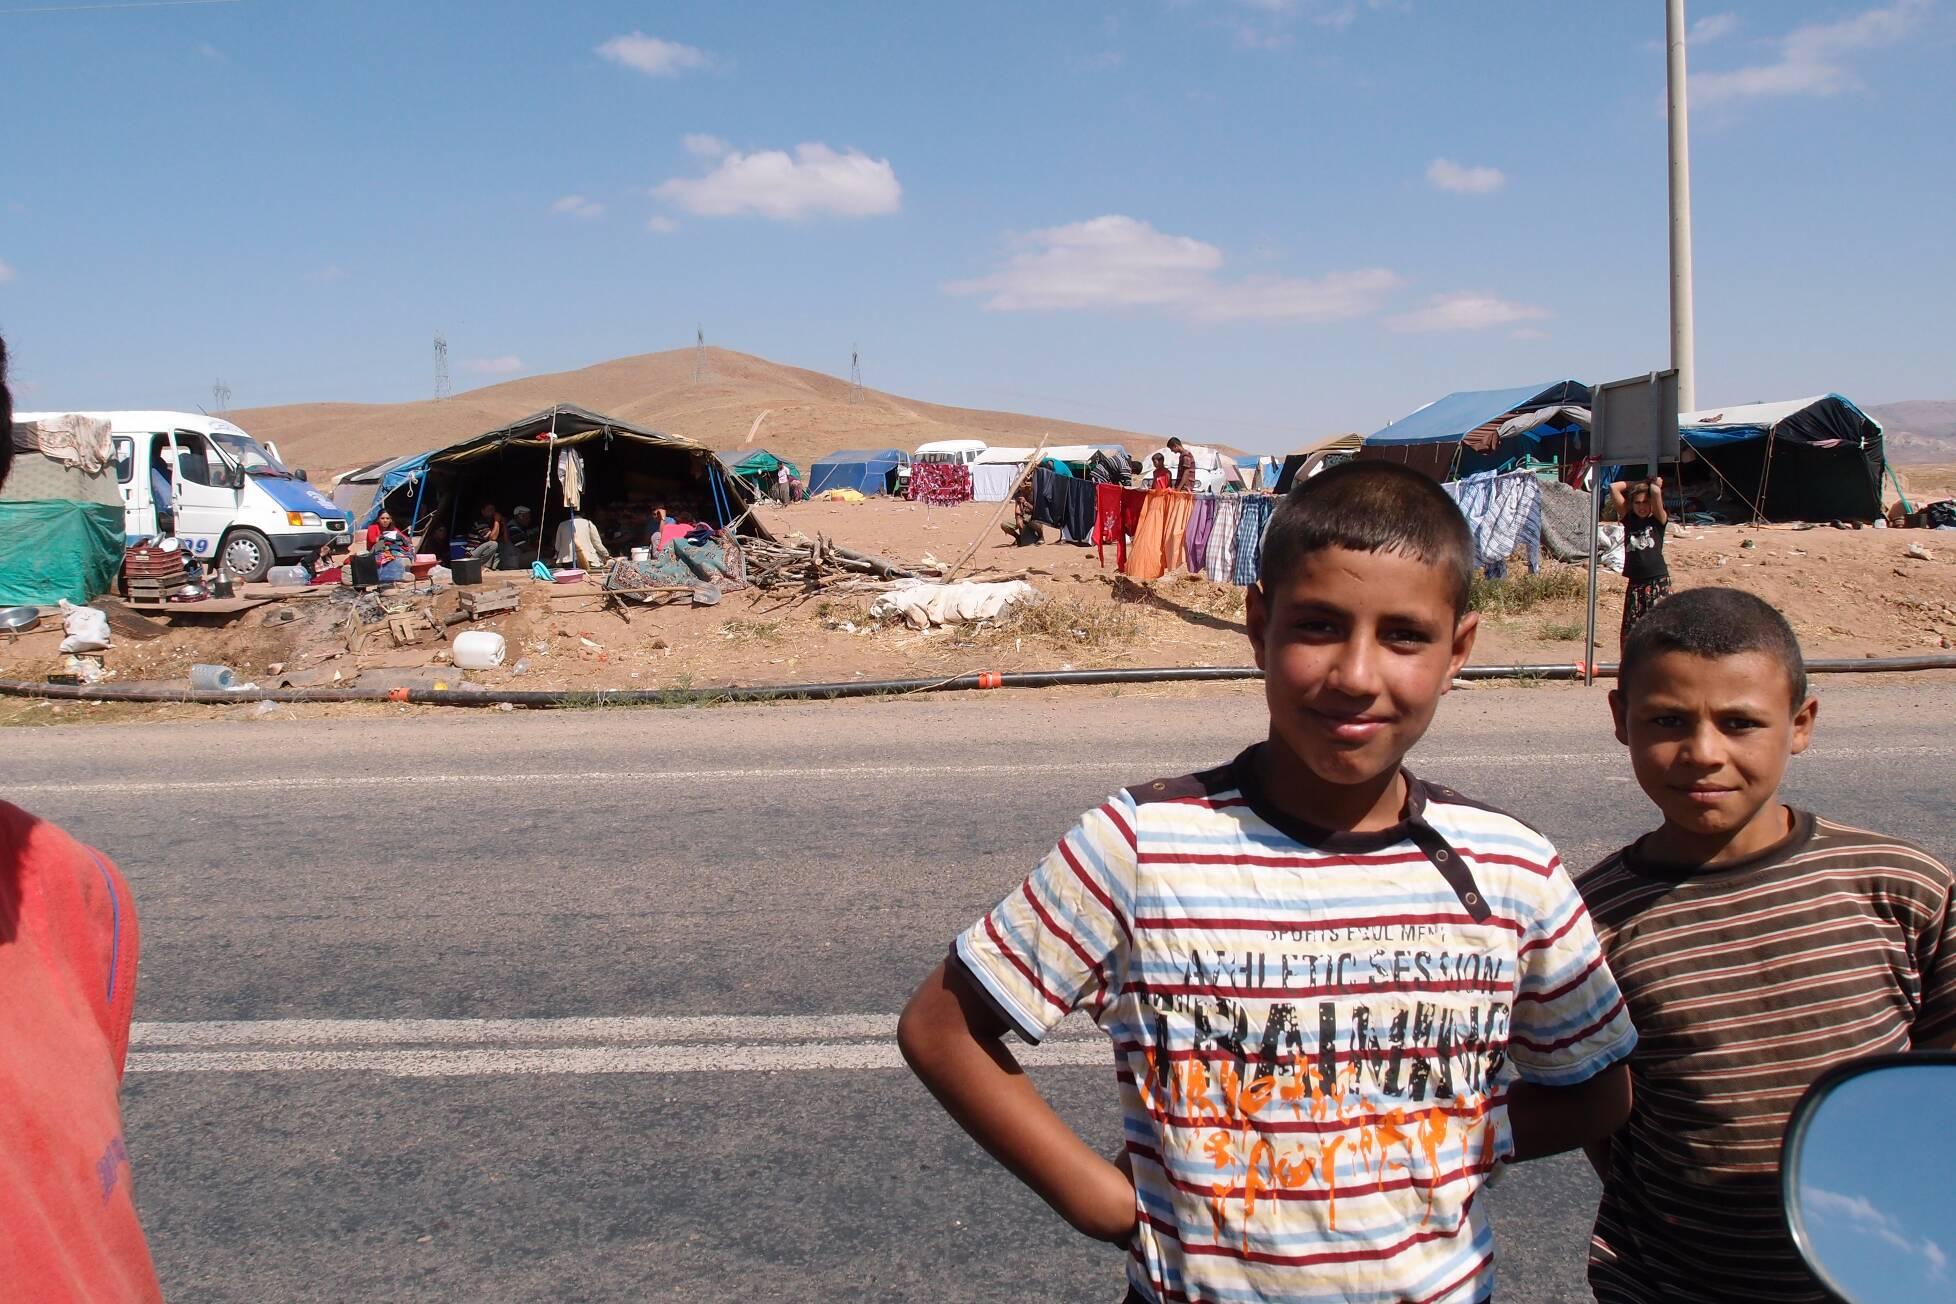 kurdische Kinder in Zeltlager